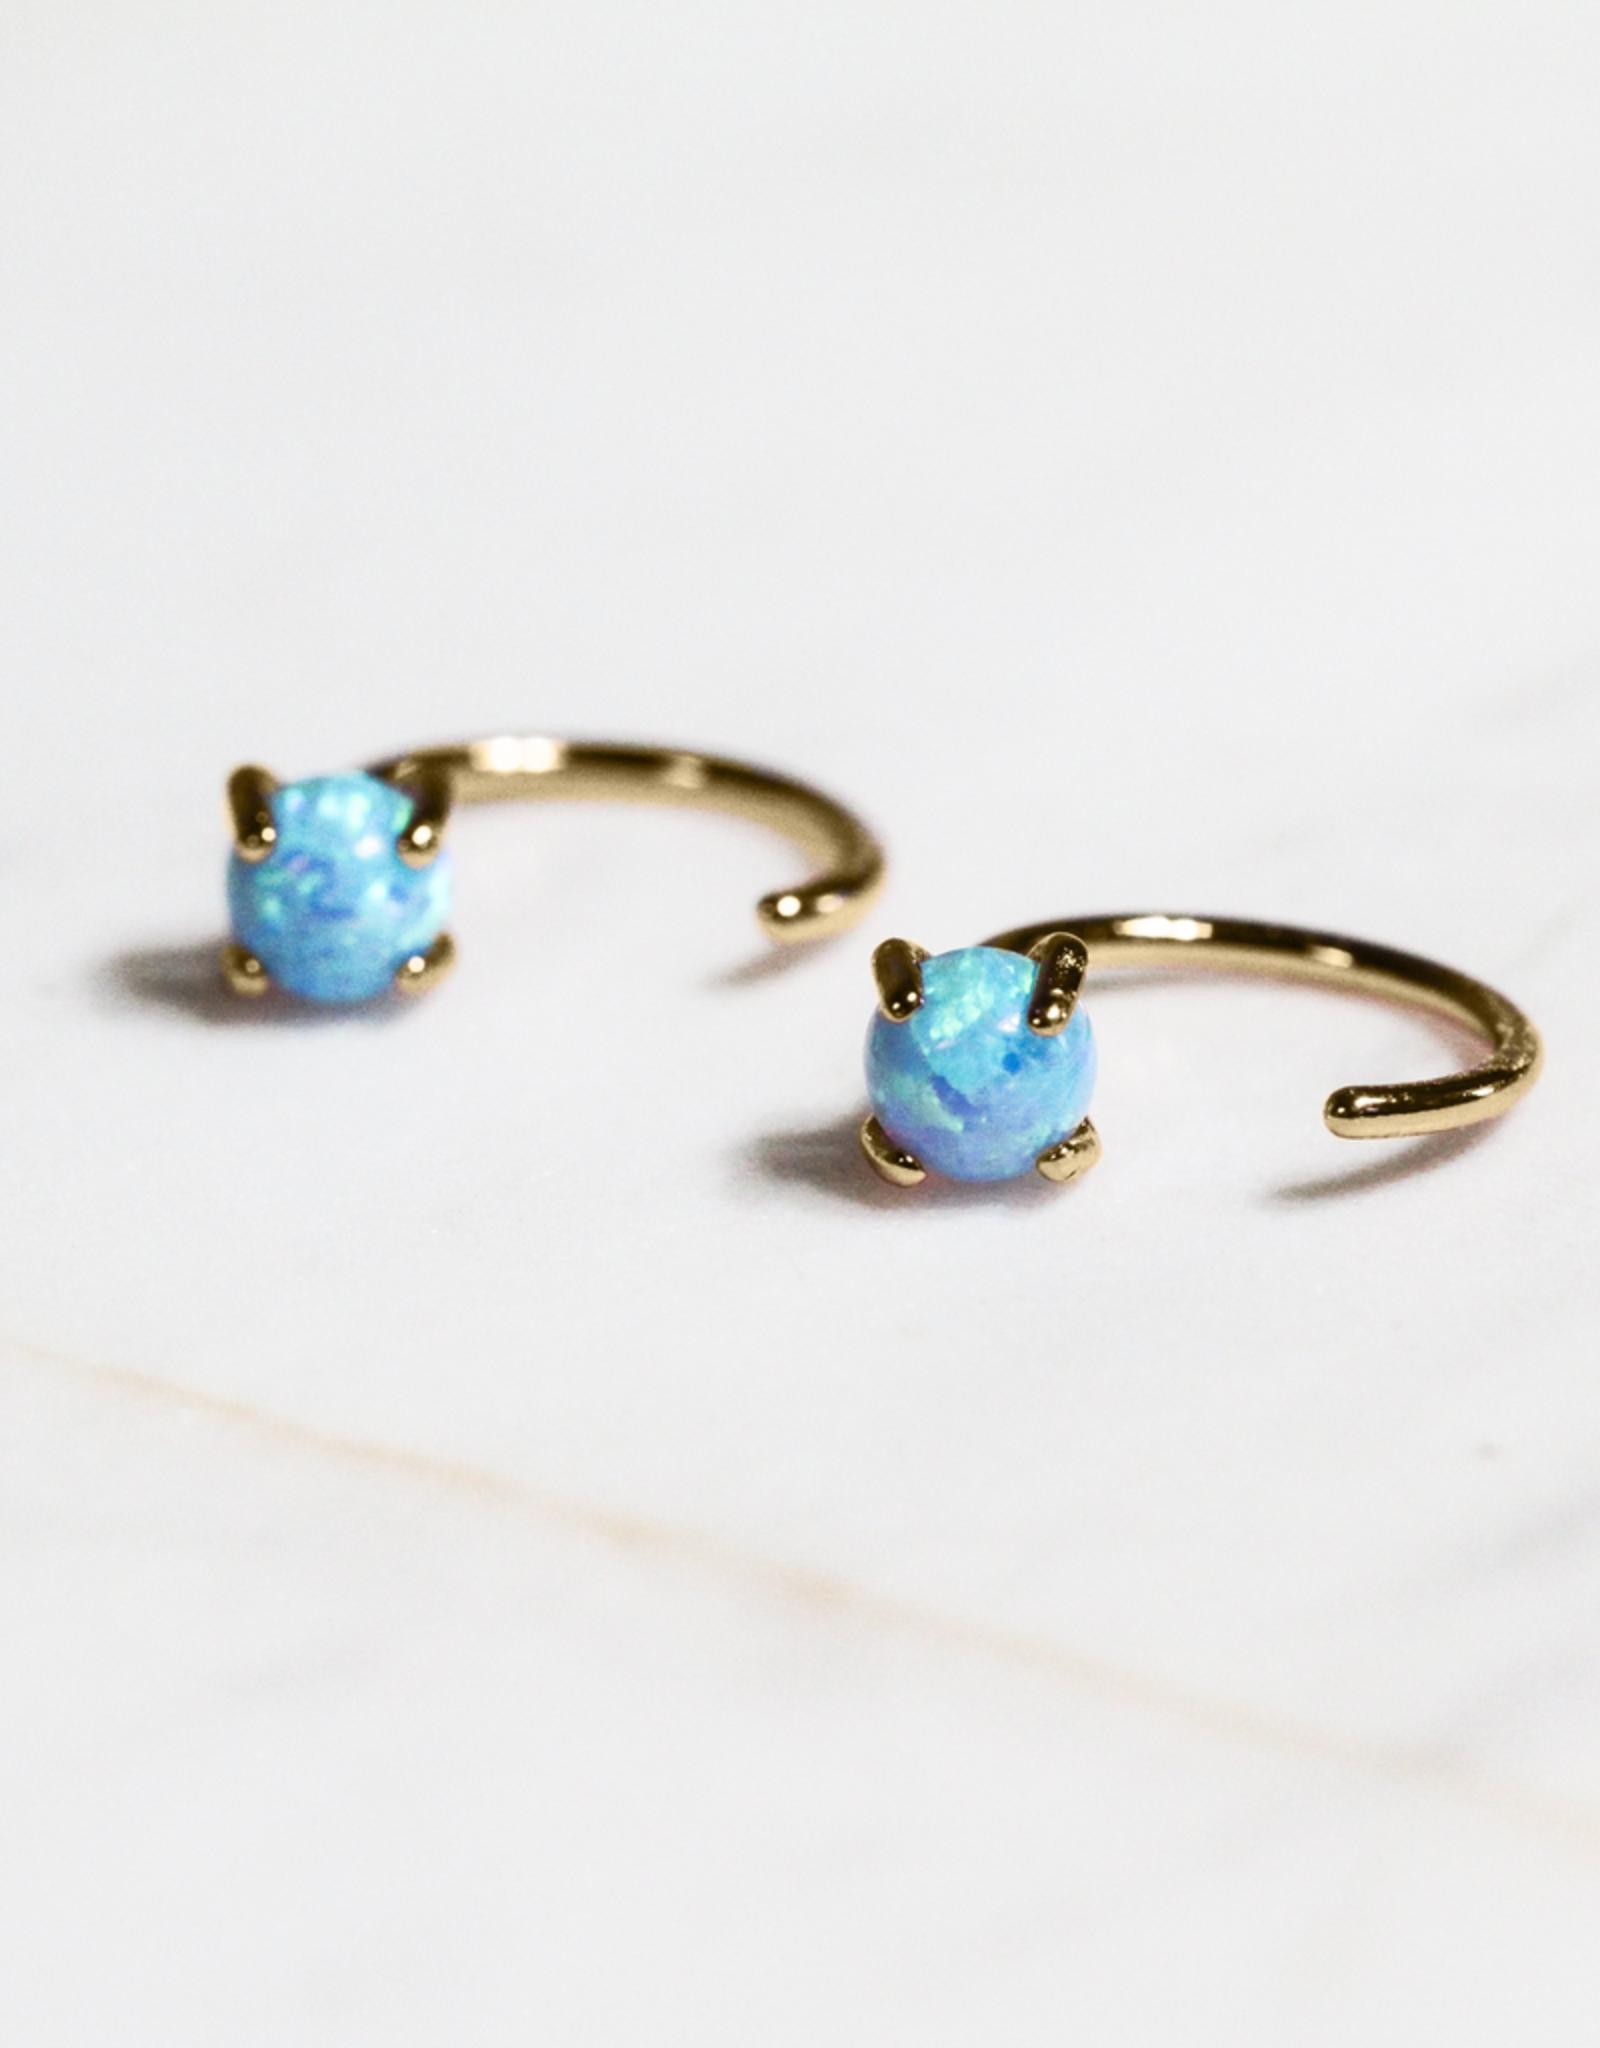 Opal Huggie Earrings Sterling Silver Base with18k Gold Plating